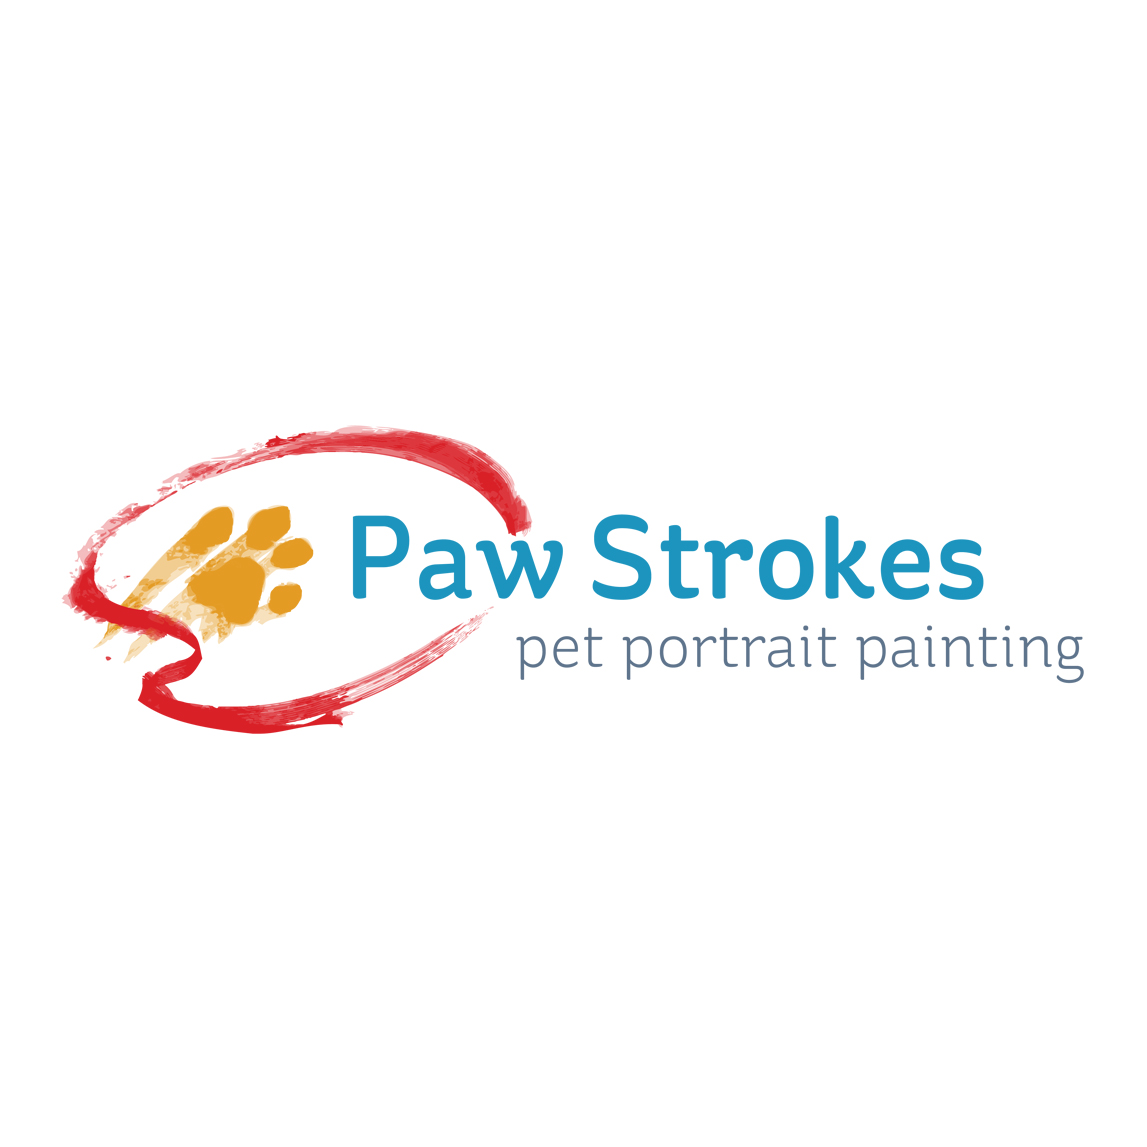 Paw Strokes